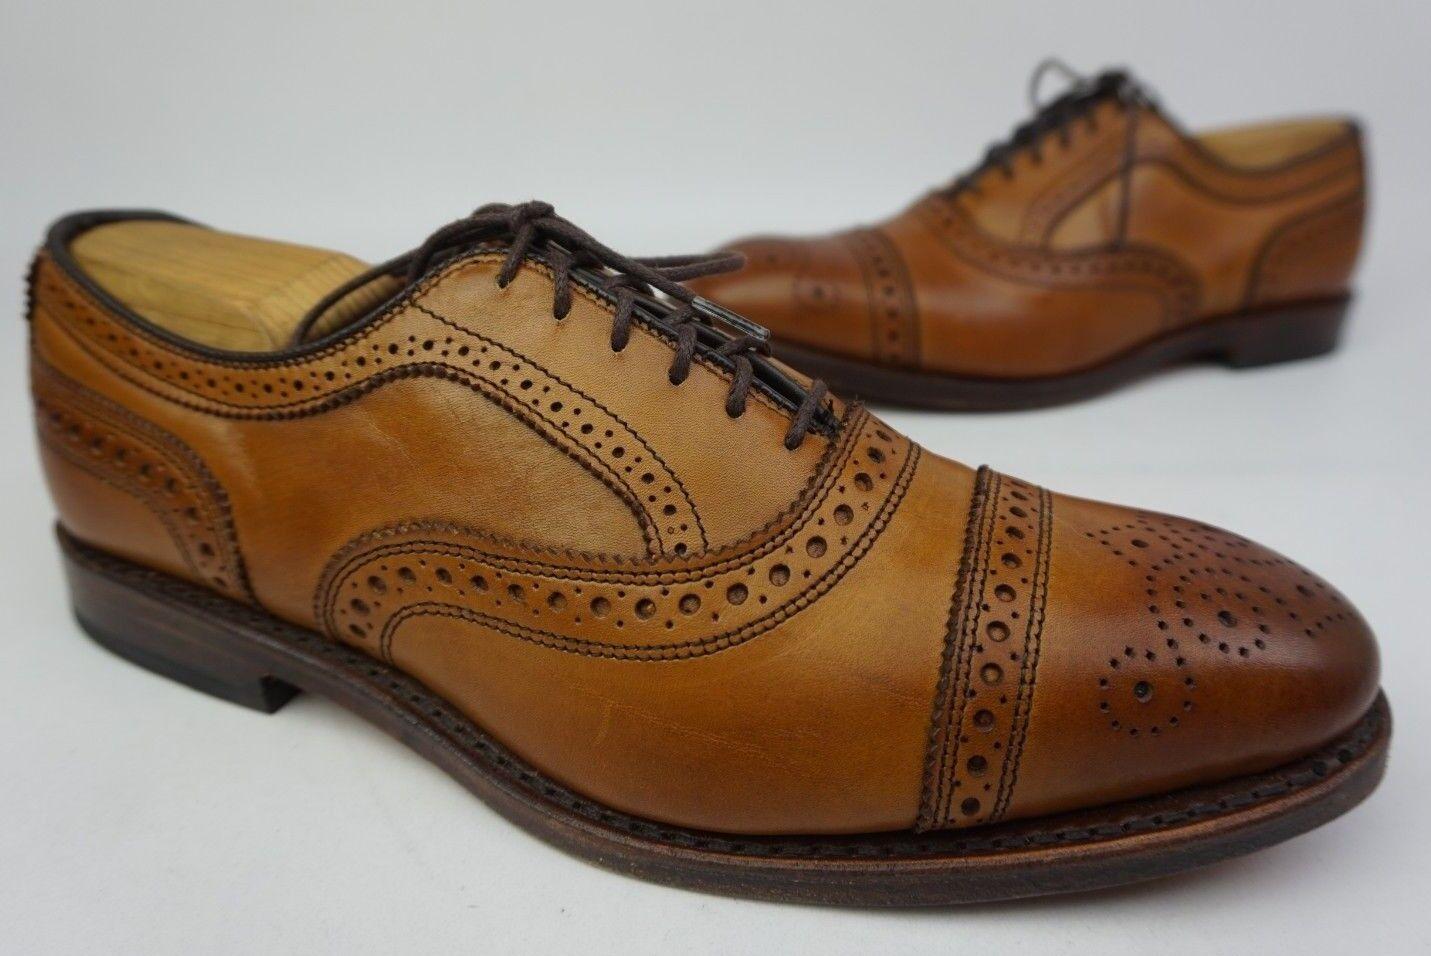 Allen Edmonds Strand Cap Toe Oxford braun Leather schuhe Größe 7.5 E